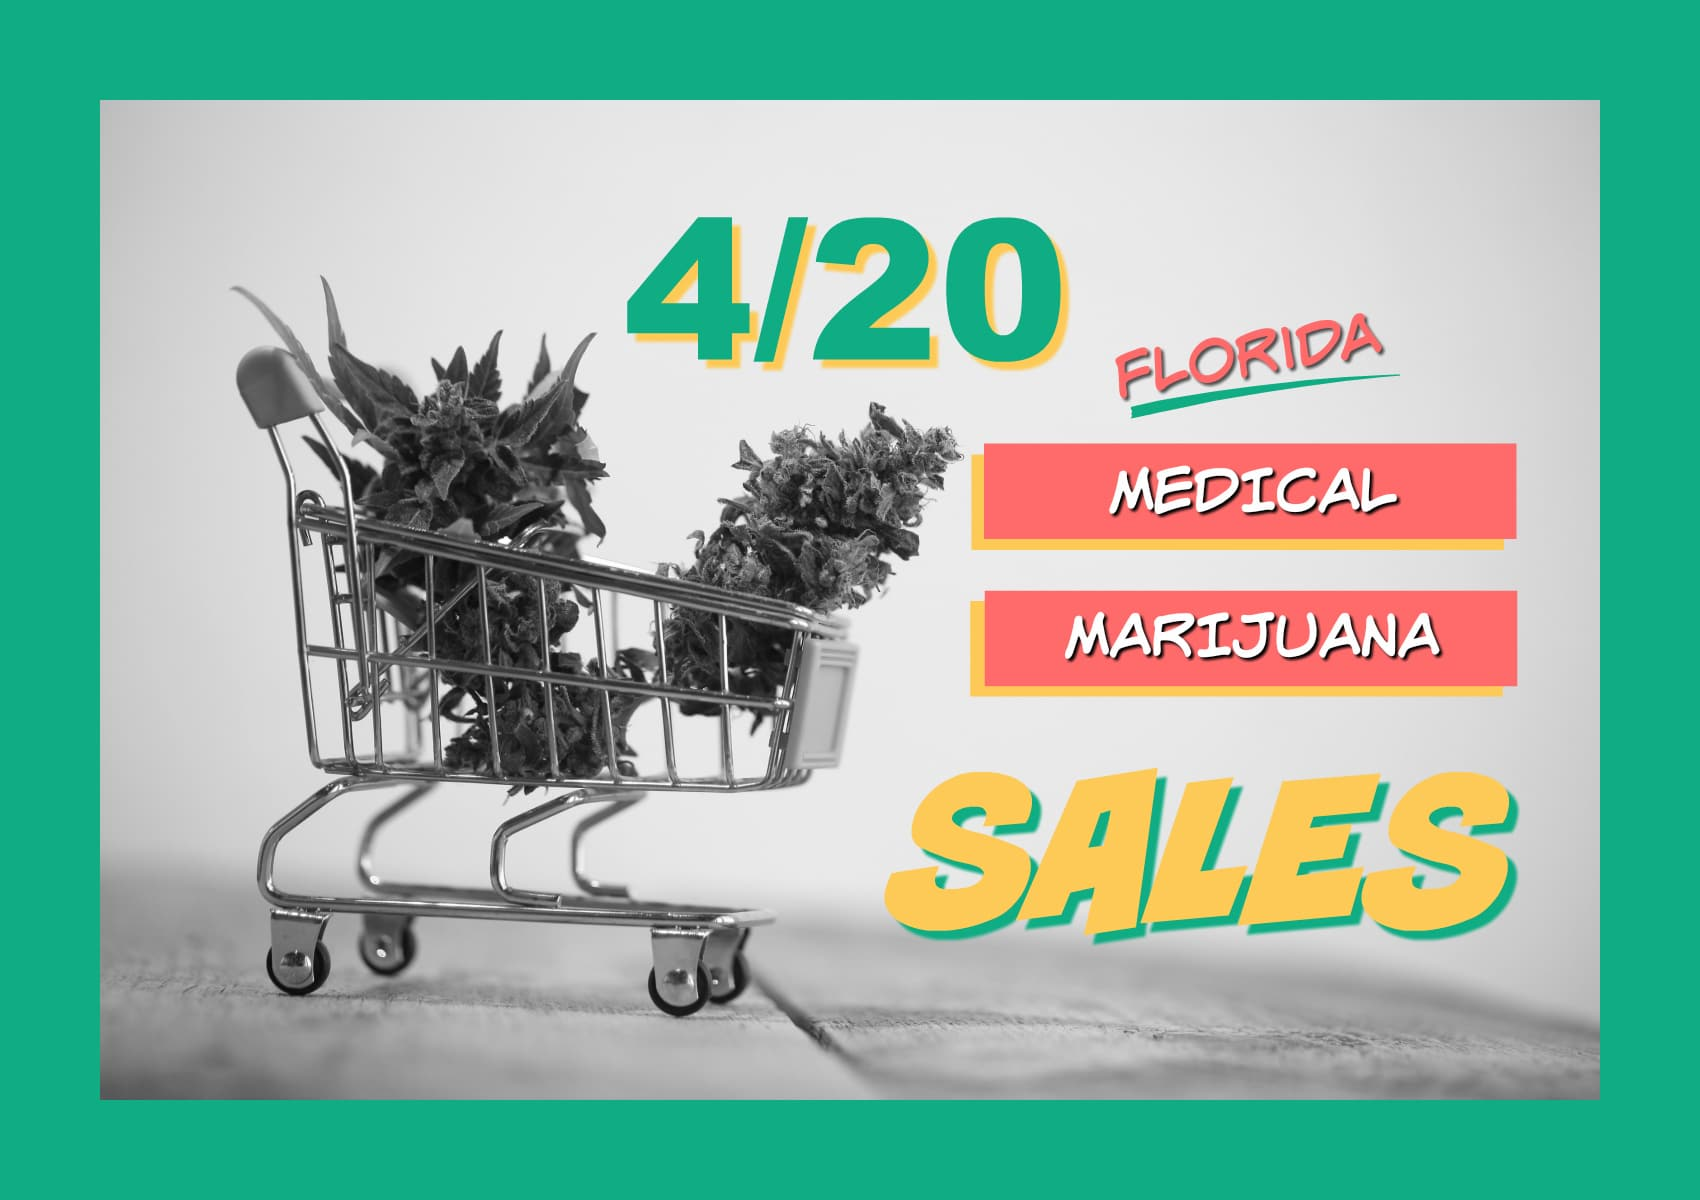 Florida Marijuana 420 Sales